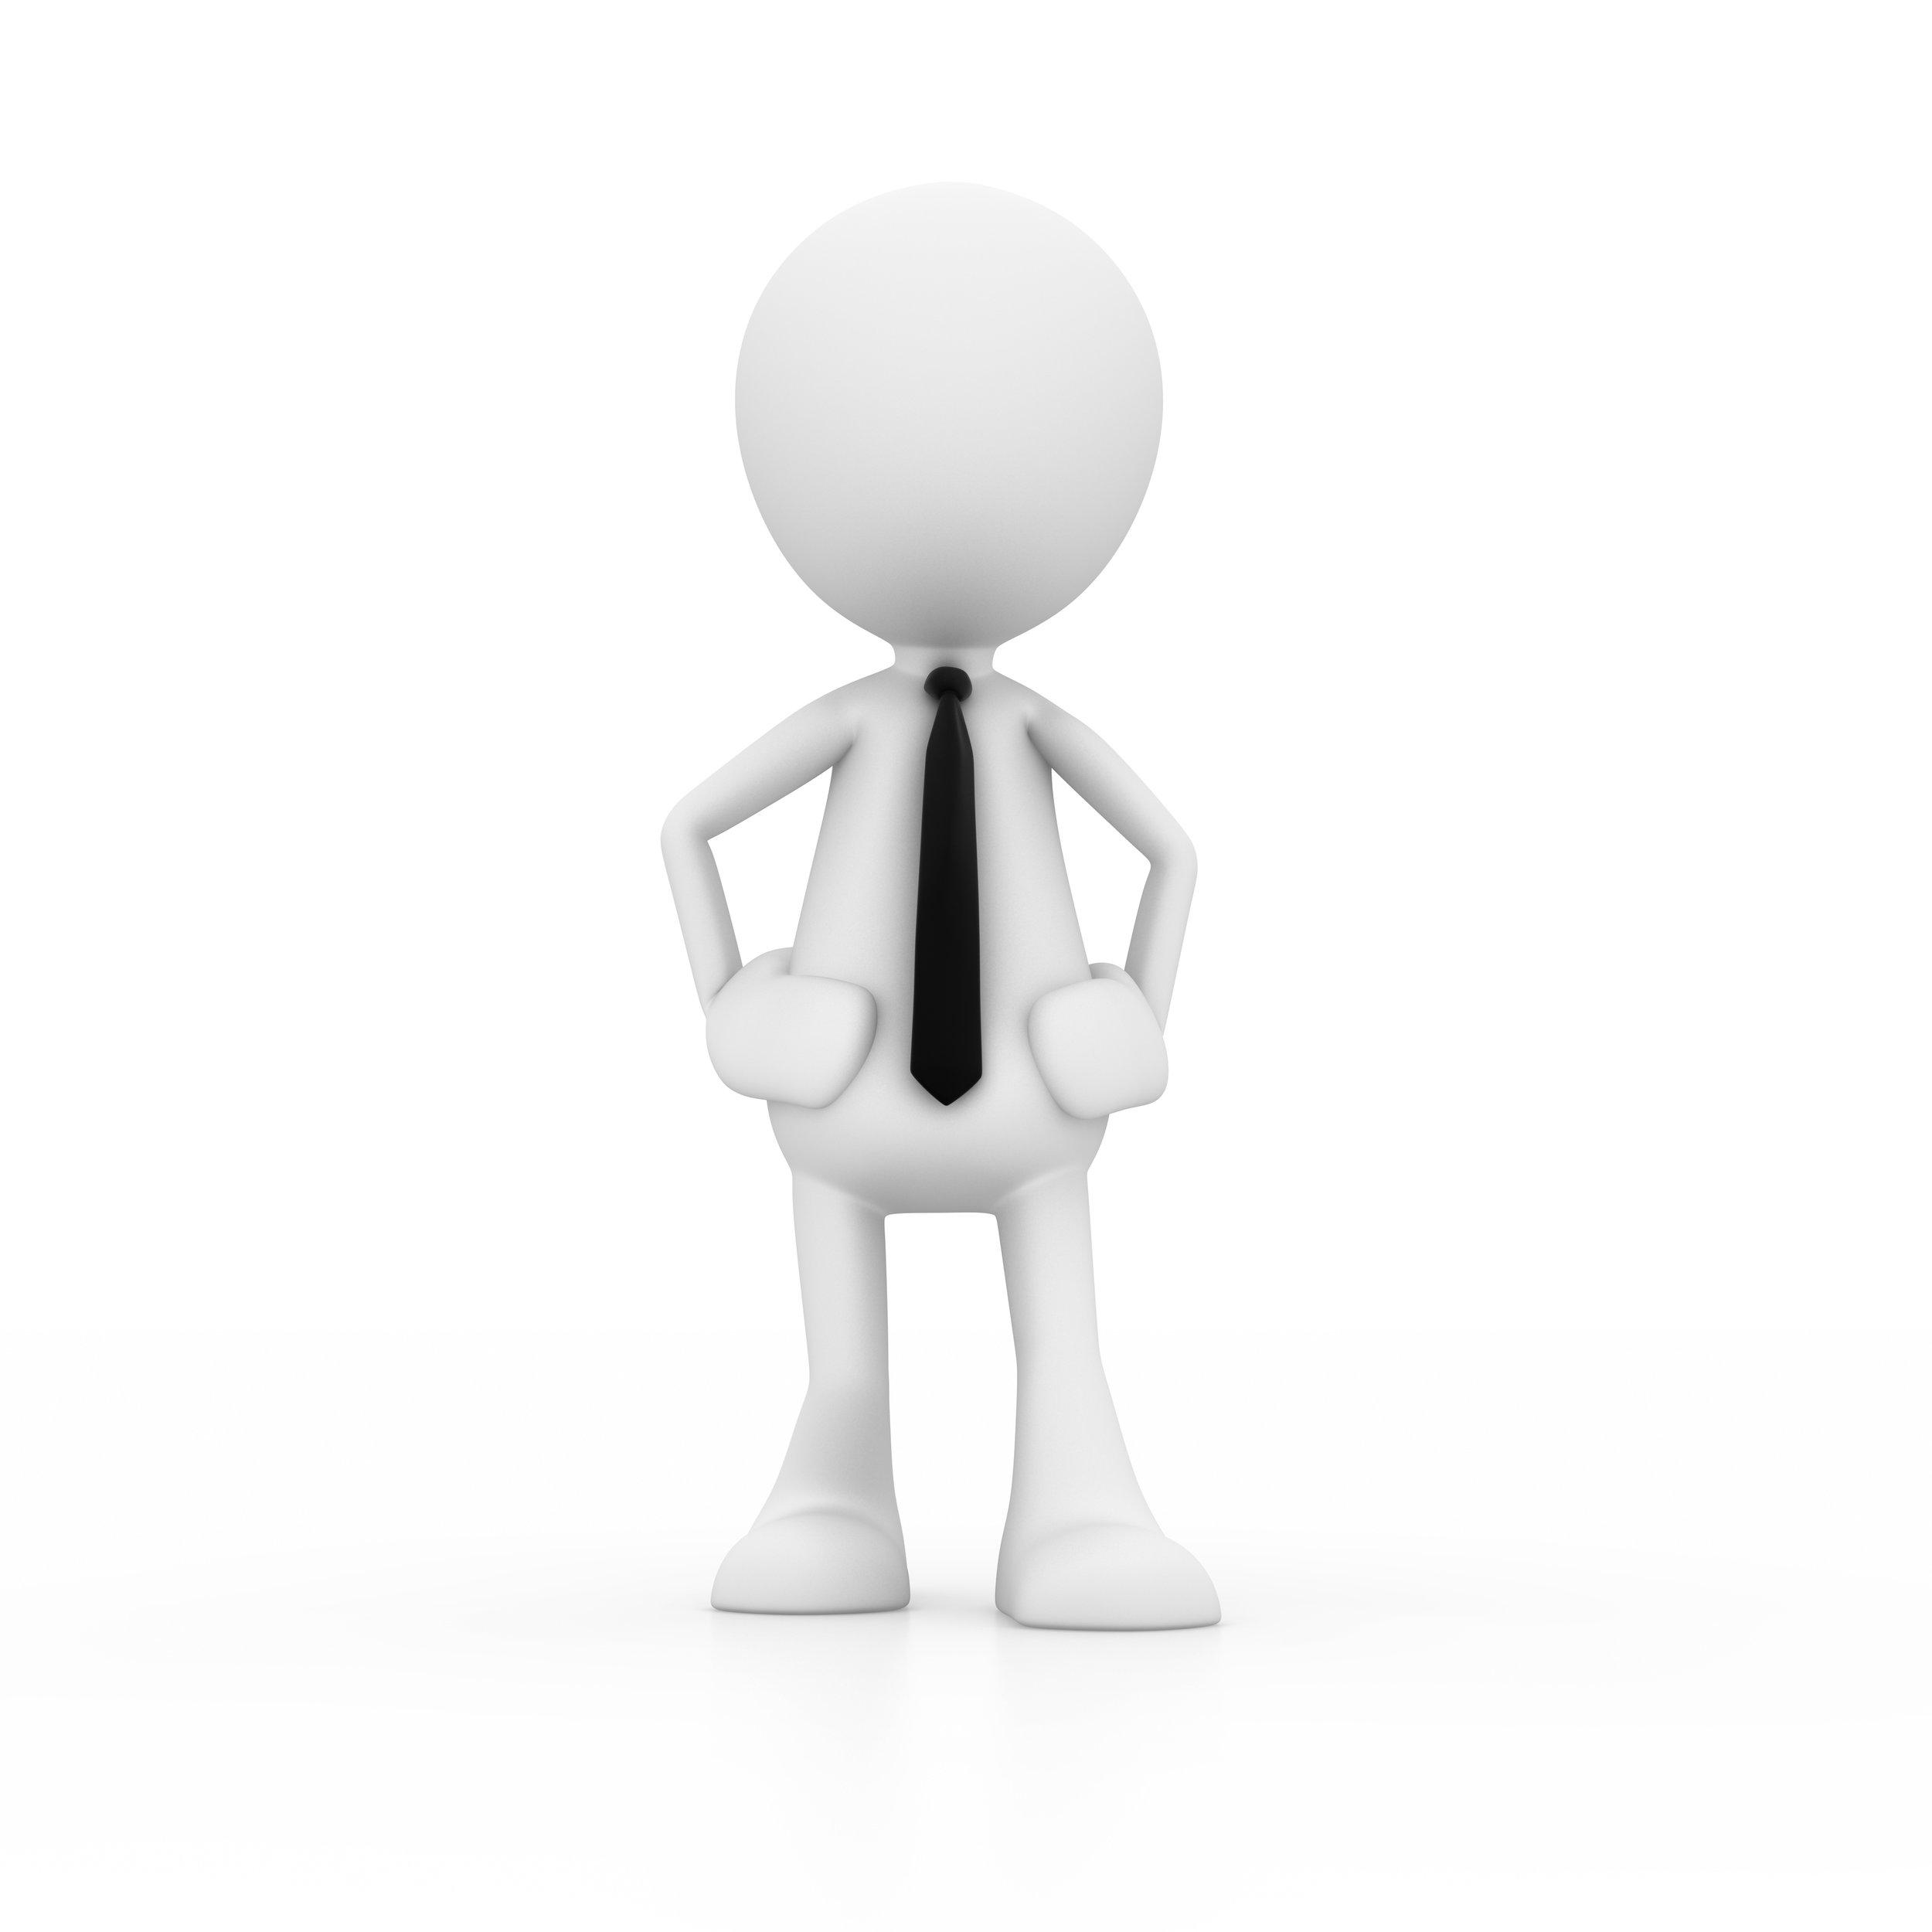 lucas reilly, MBA - Marketing Directorhttps://www.linkedin.com/in/lucas-reilly-1b75b05/